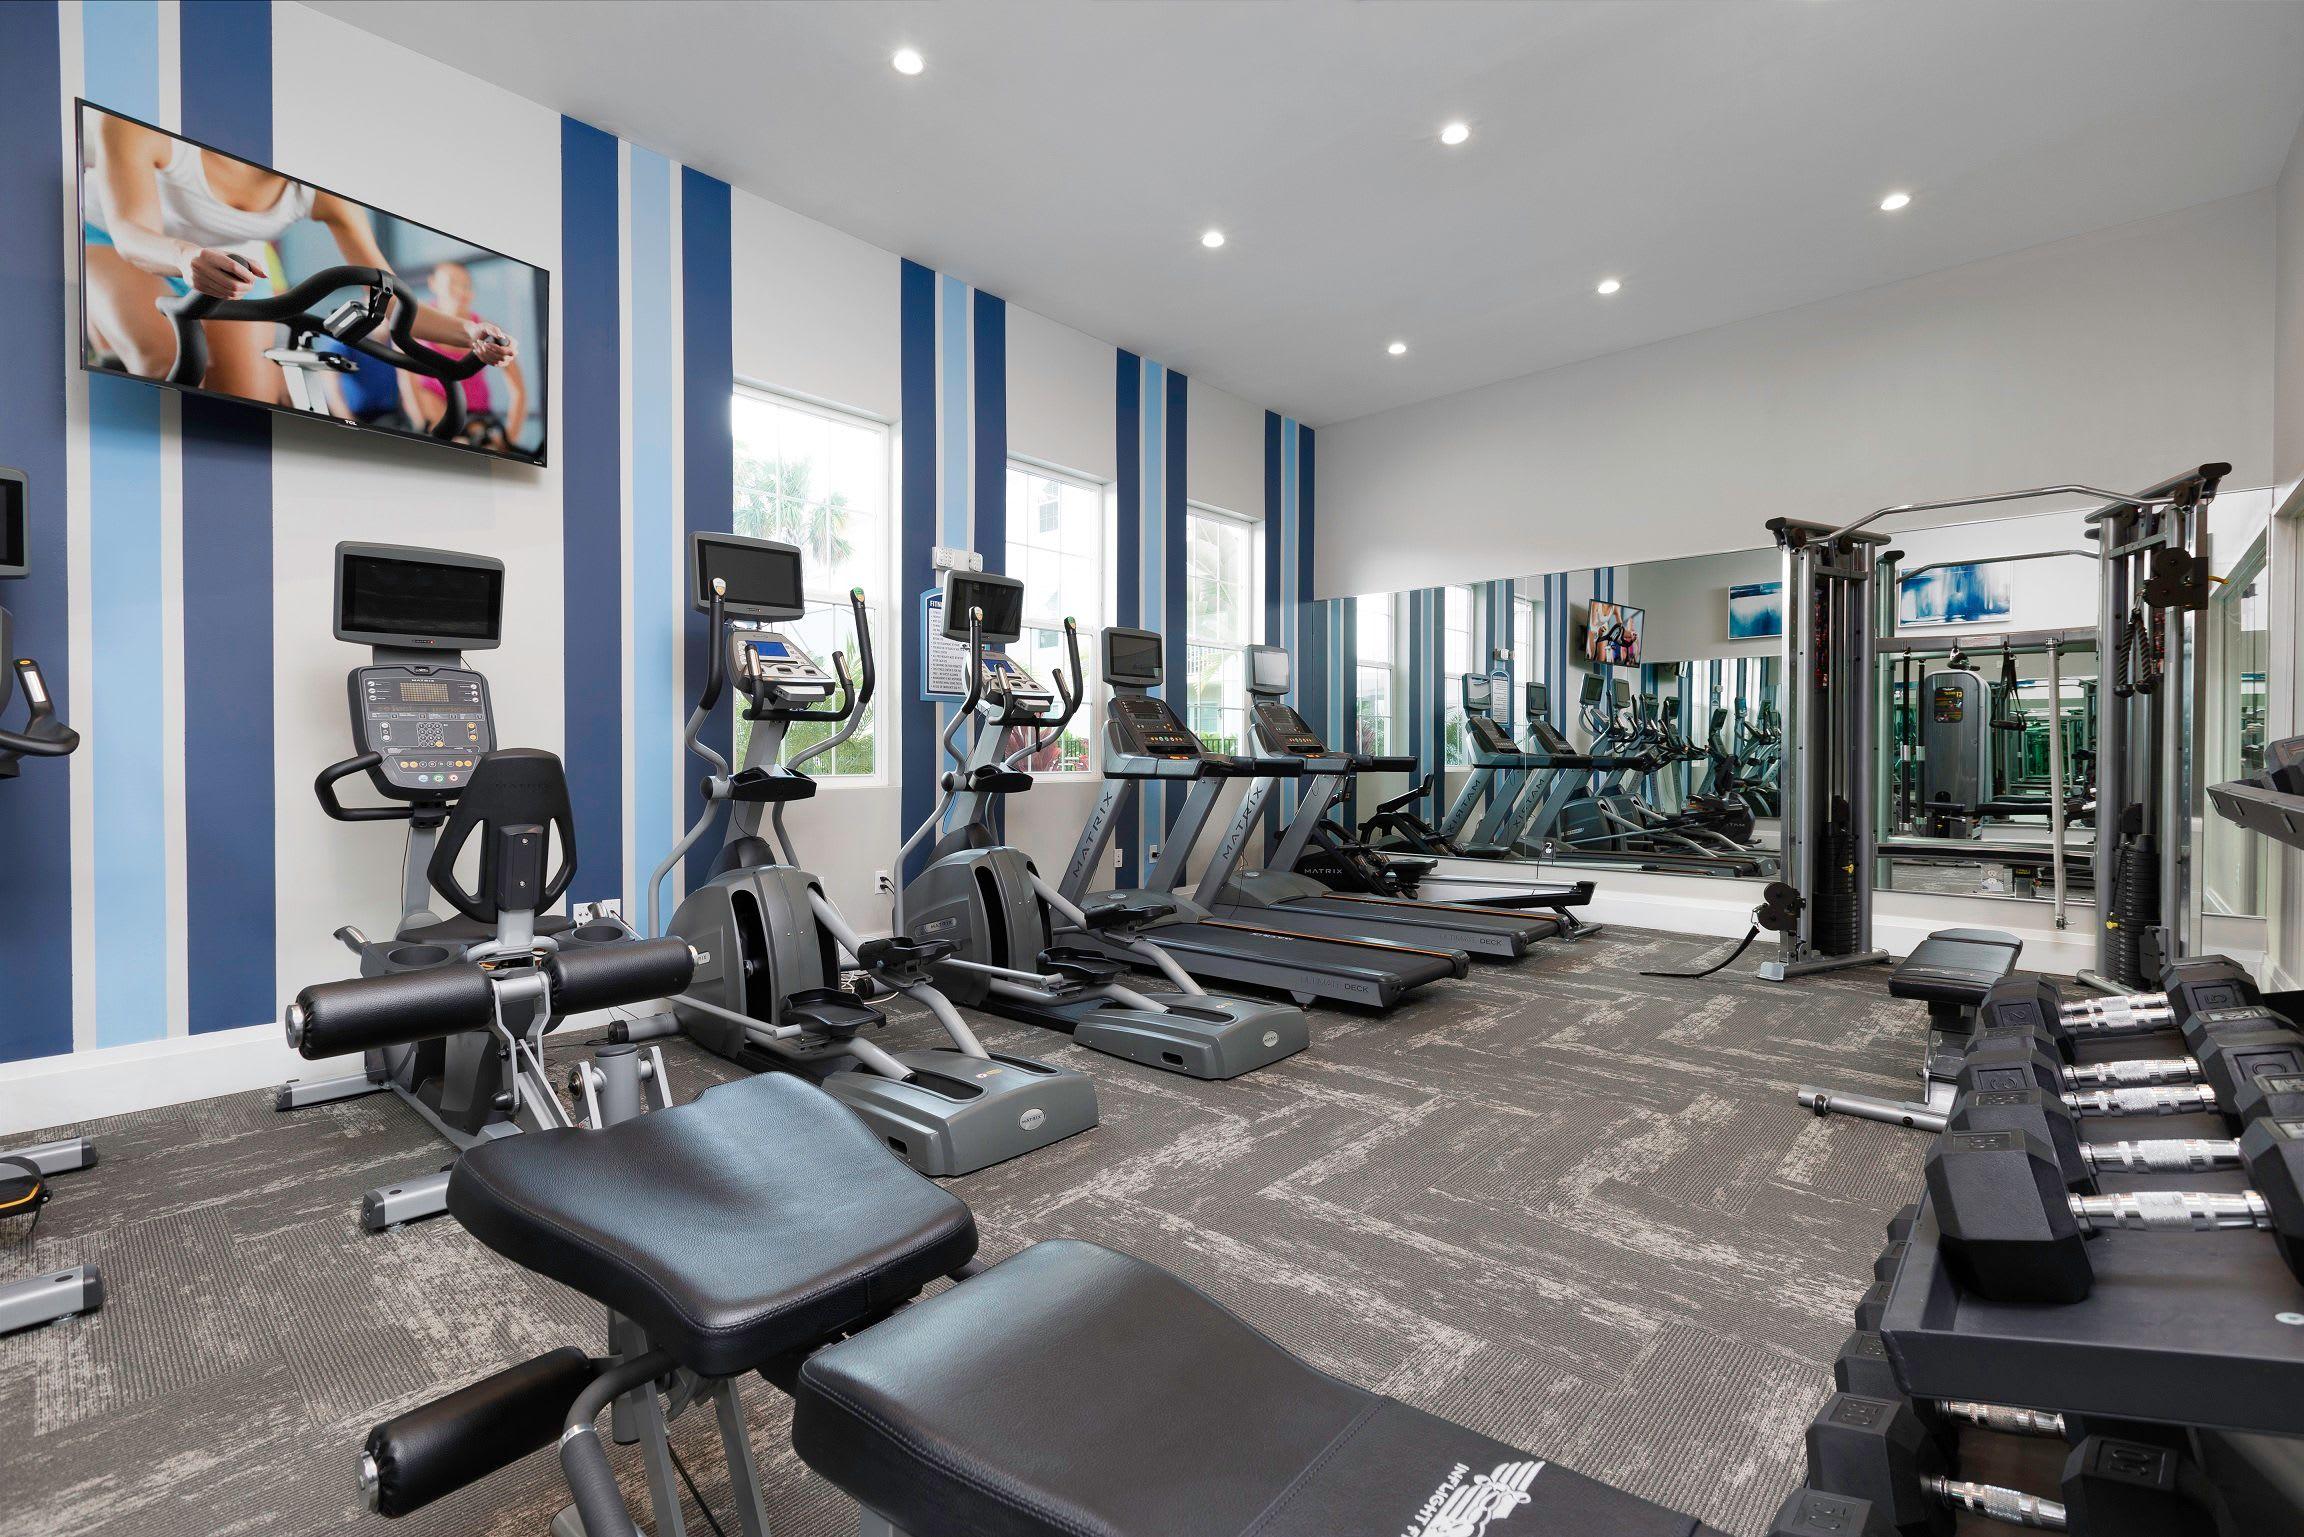 Fitness center at High Ridge Landing in Boynton Beach, Florida